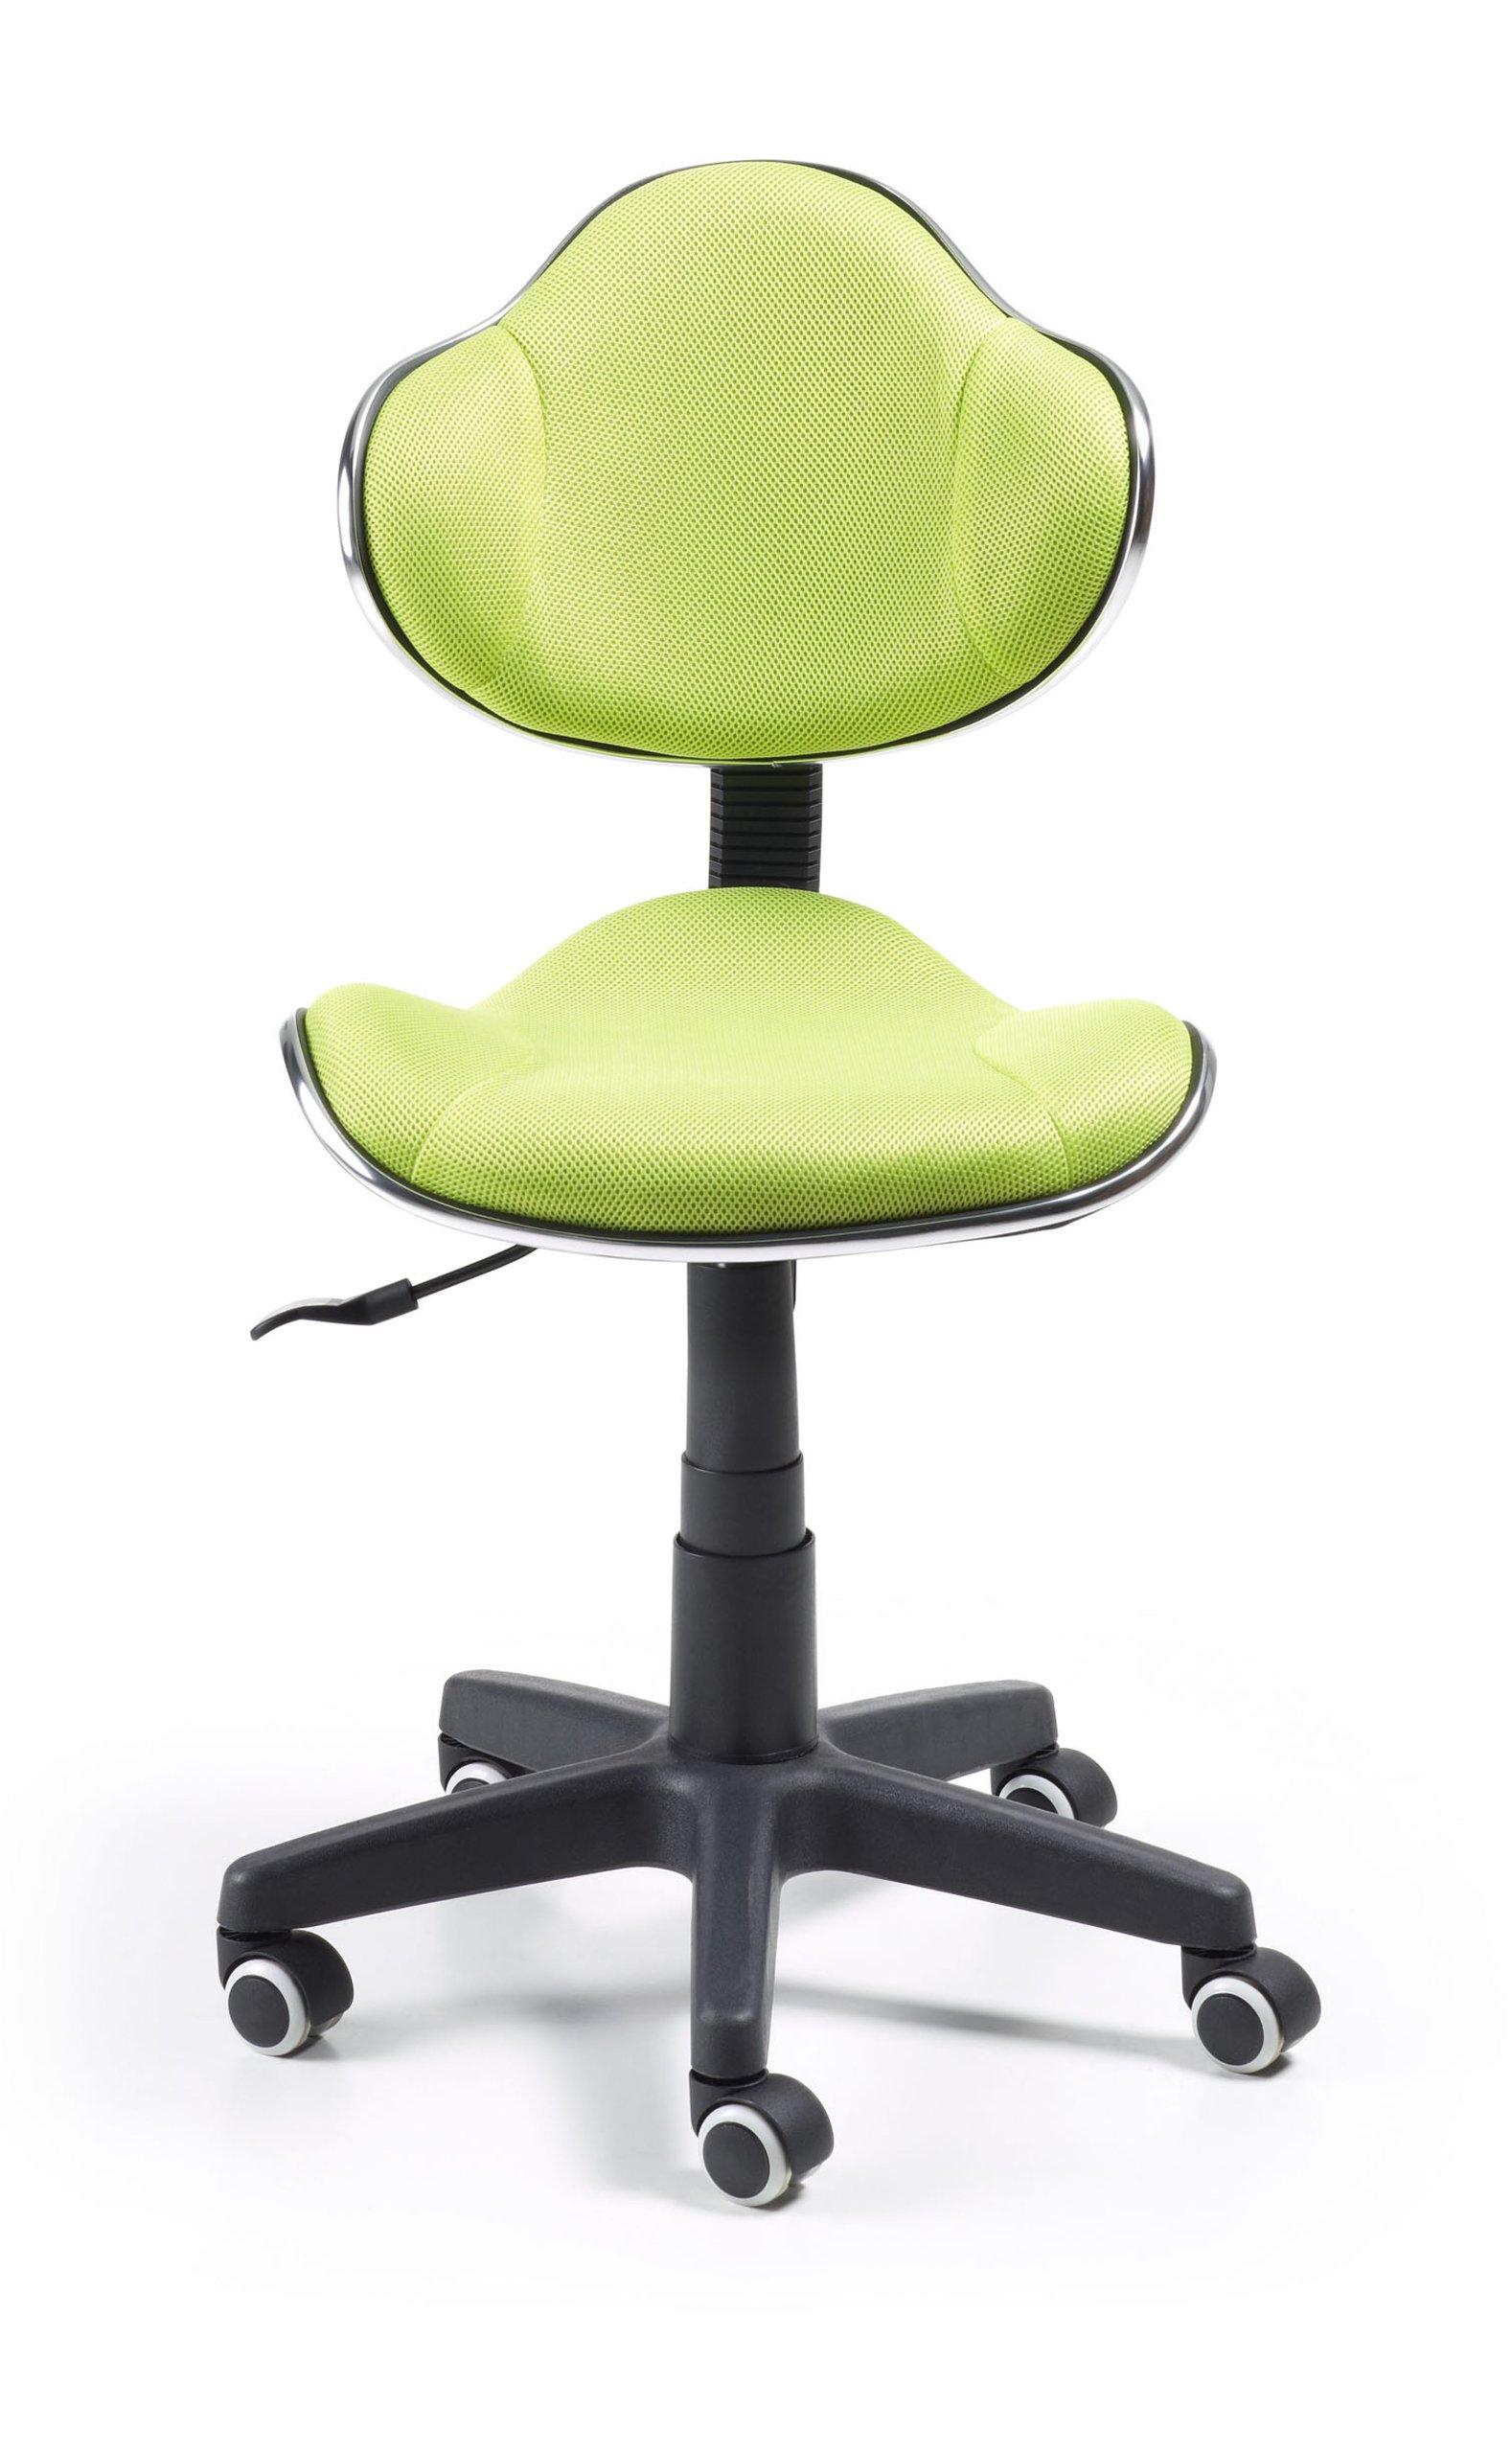 Silla de oficina juvenil, color verde product image